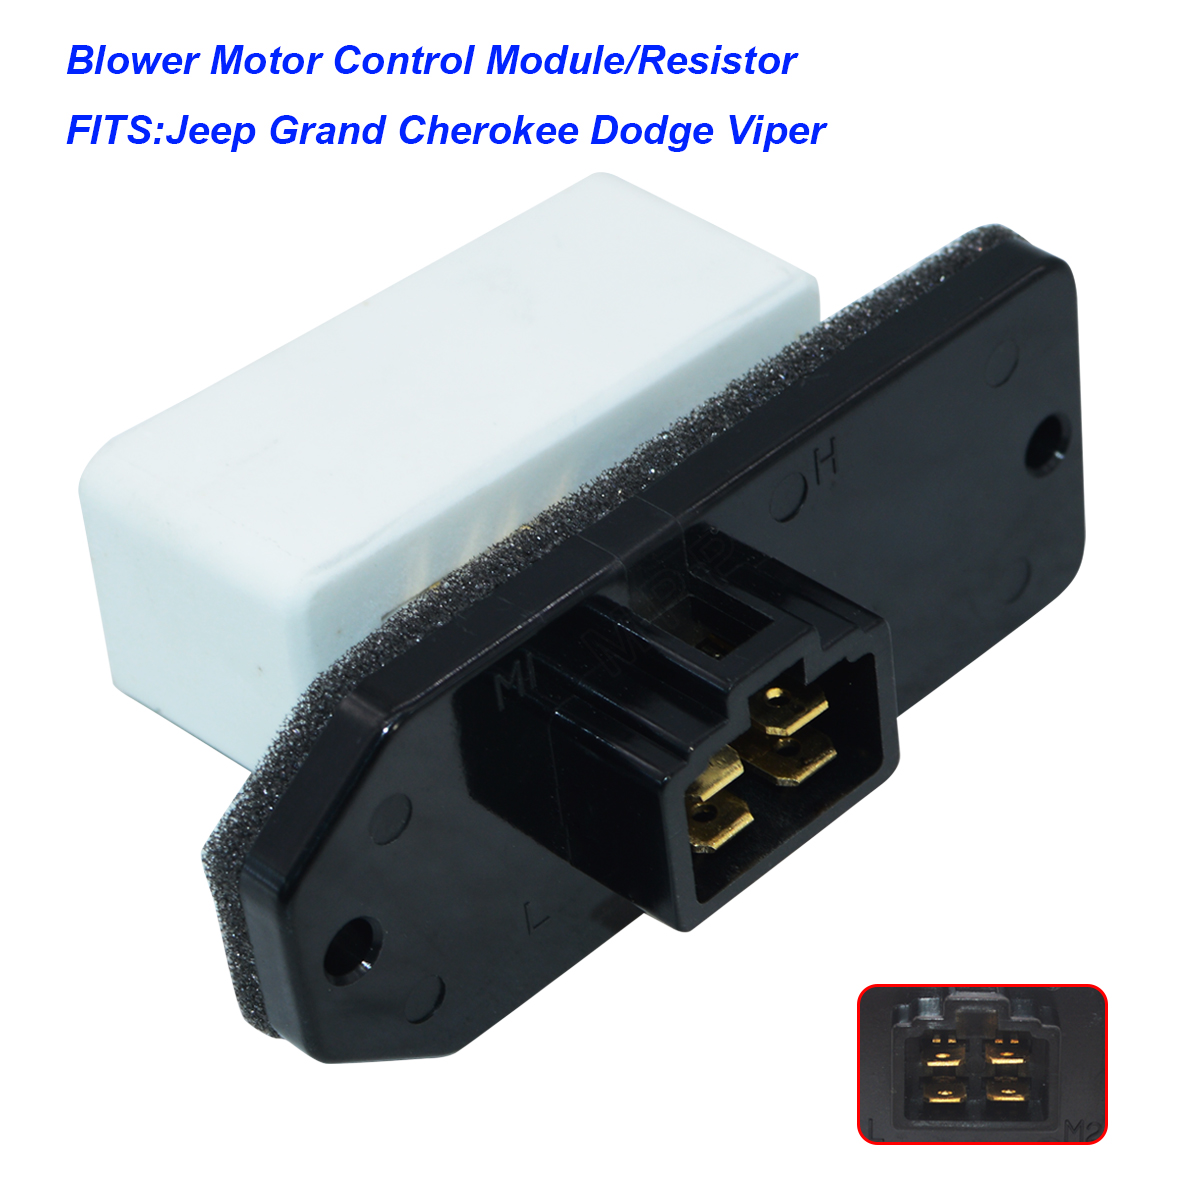 New Heater Blower Motor Resistor for Dodge Jeep Grand Cherokee RU1061  5014212AA